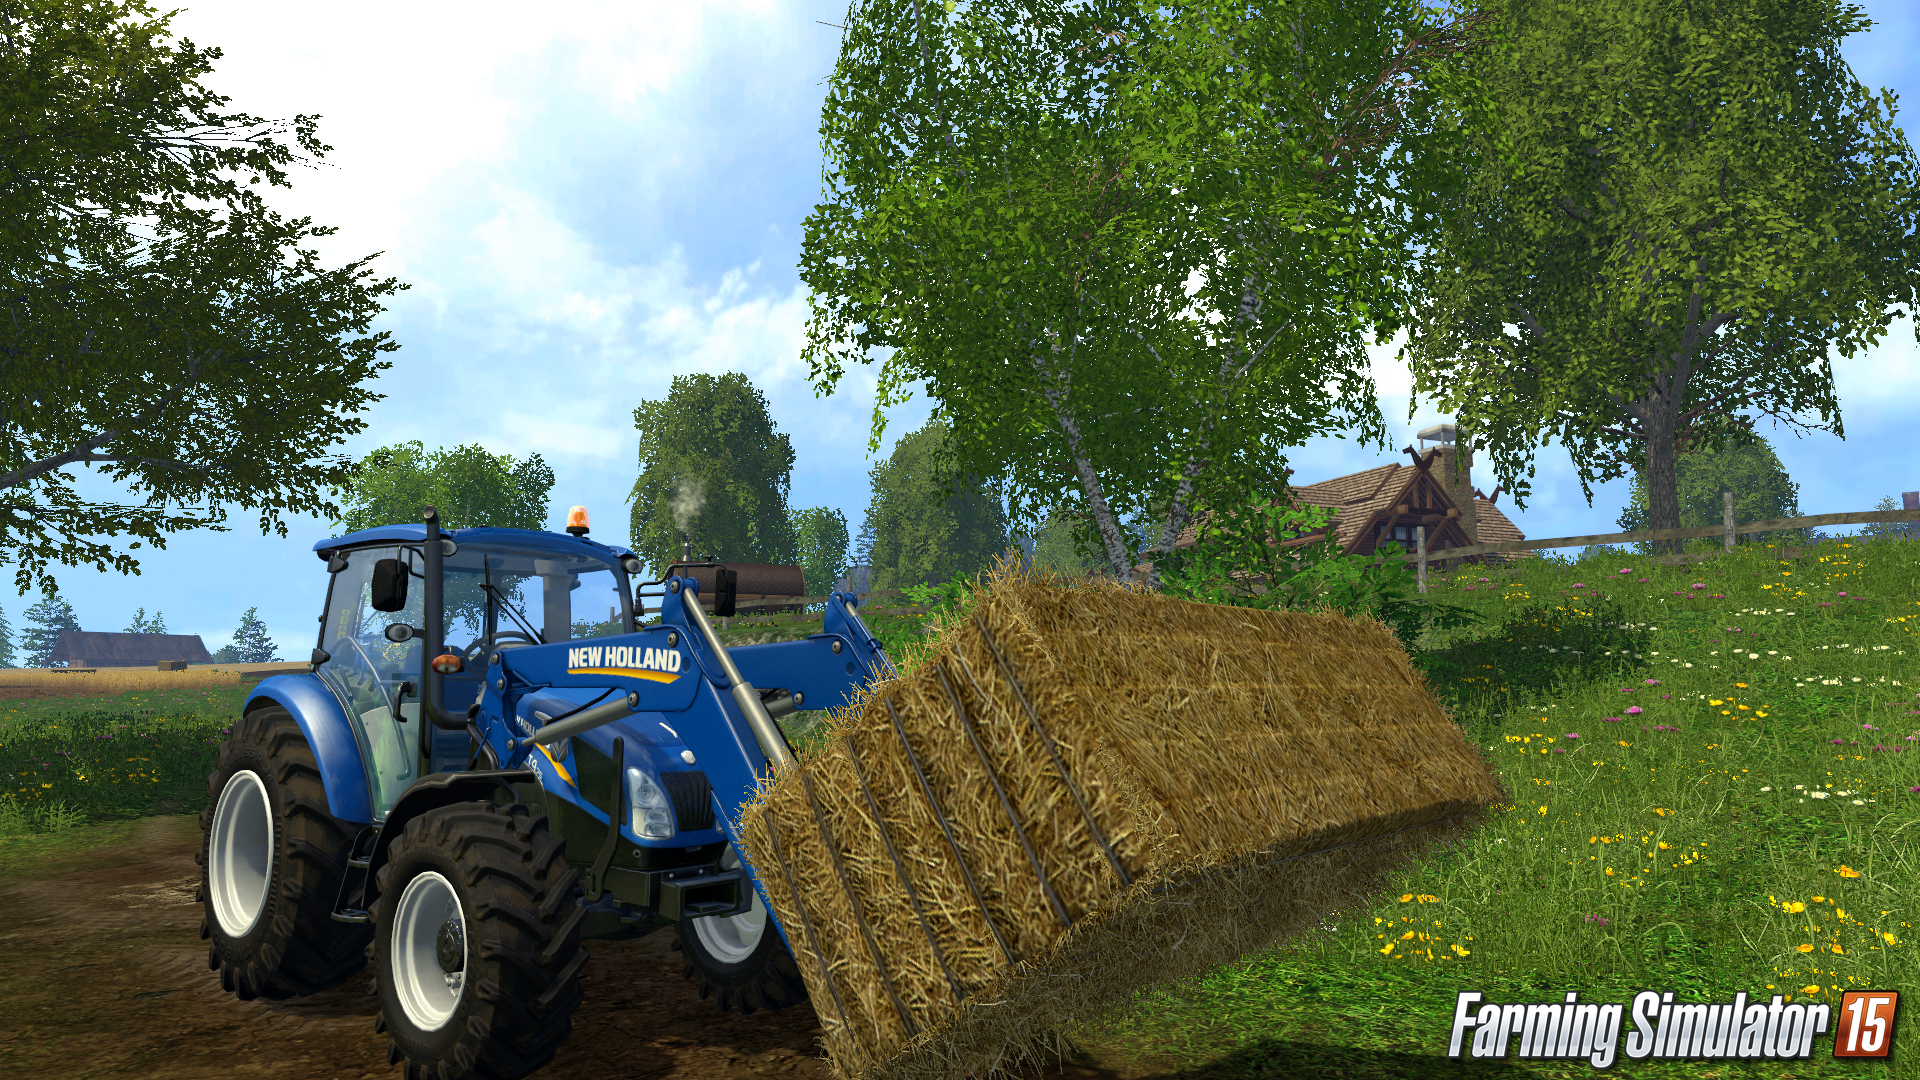 Farming Simulator 15 - Focus Home Interactive